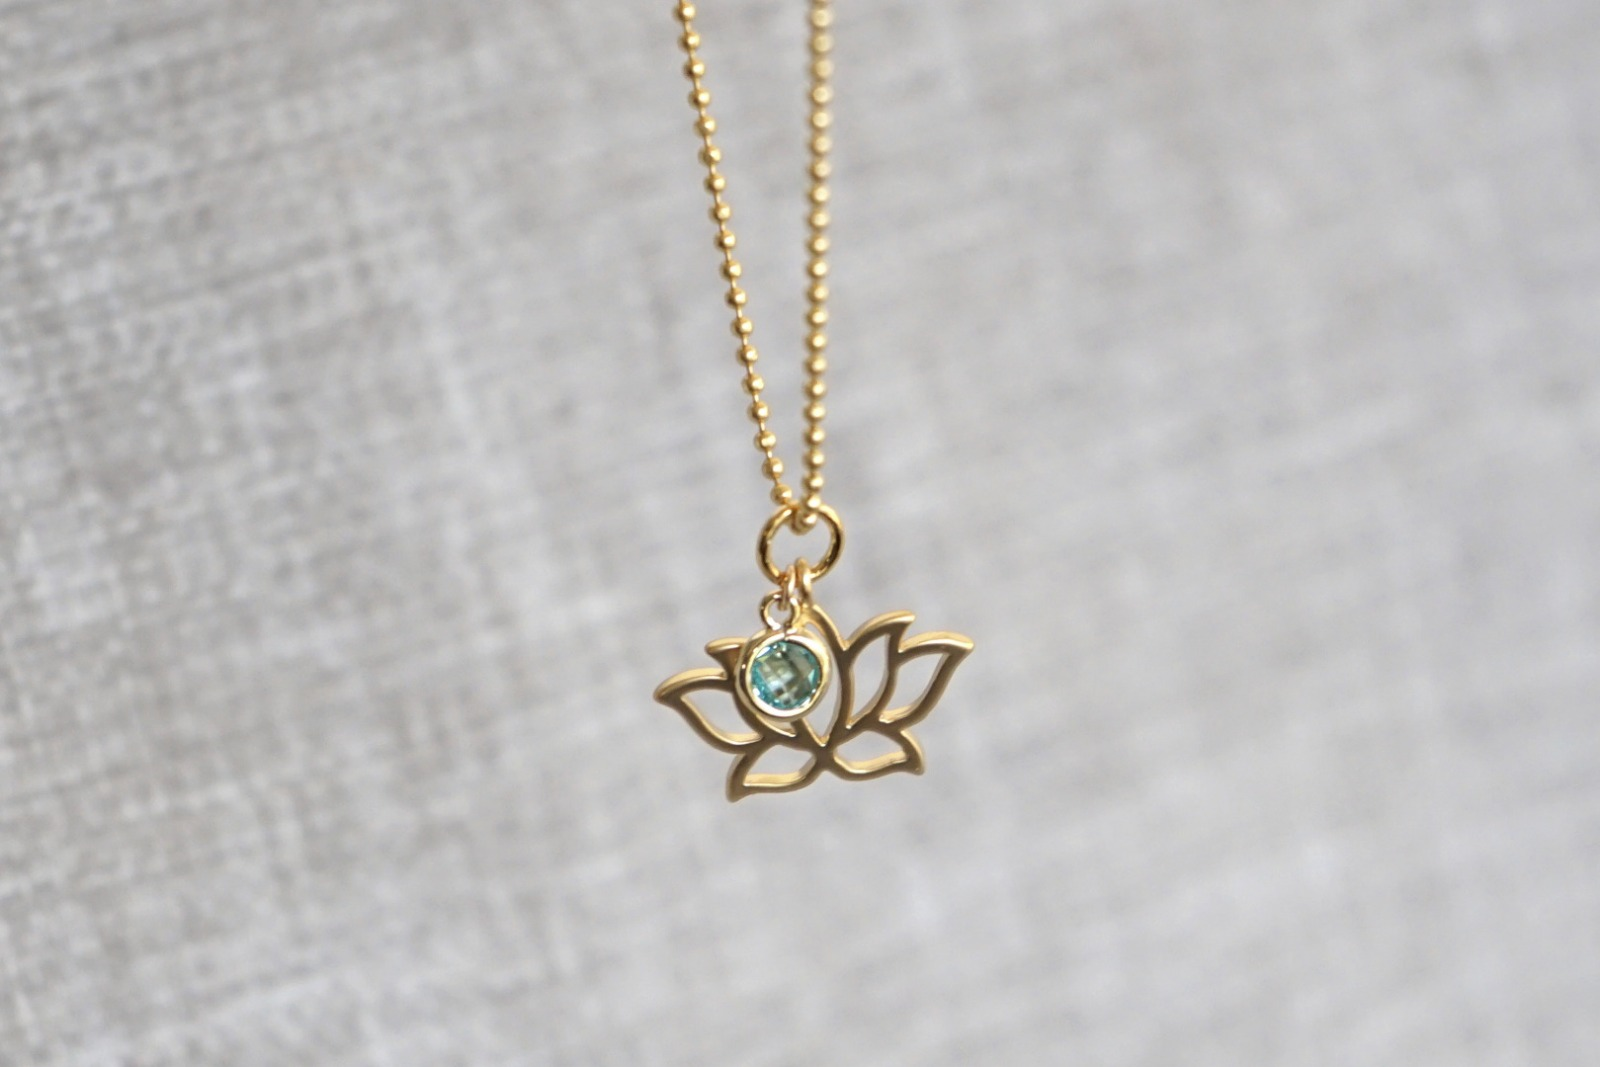 Kugelkette mit Lotusblüte und Kristall türkis - 2